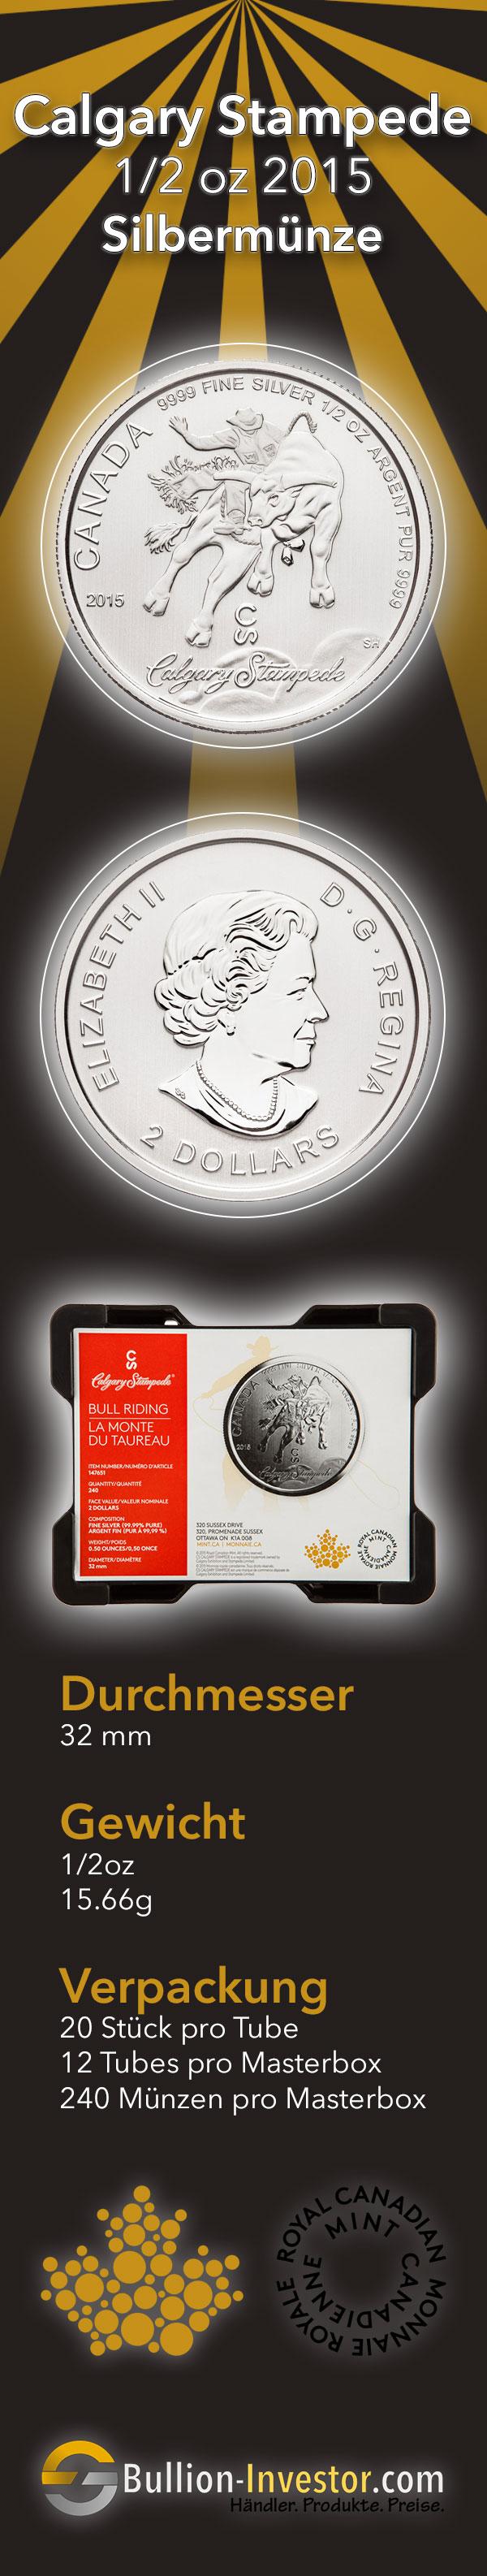 calgary-stampede-1-2oz-2015-royal-canadian-mint-bullion-investor-com